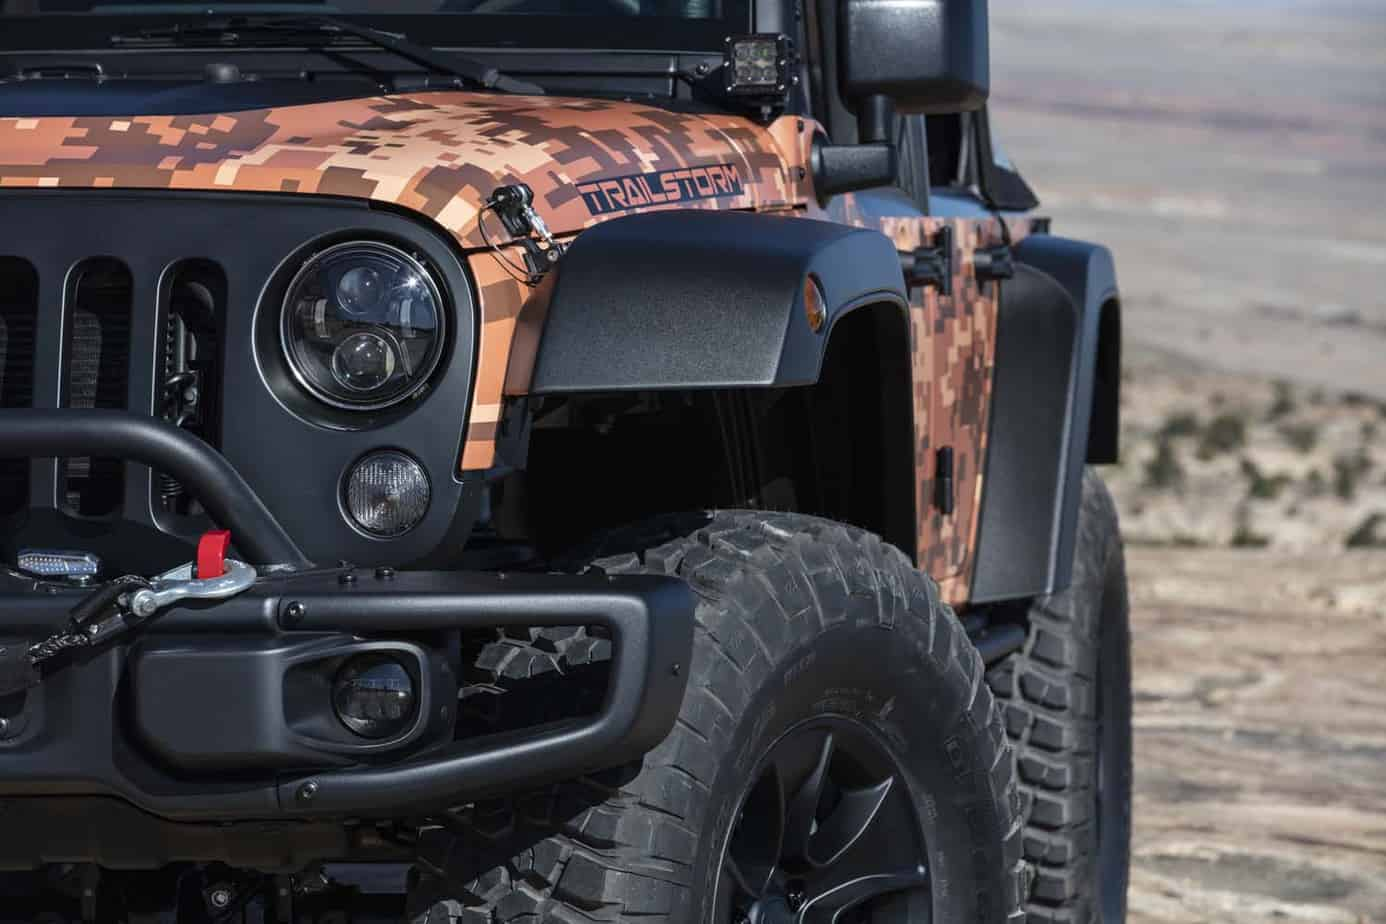 Jeep Trailstorm 020